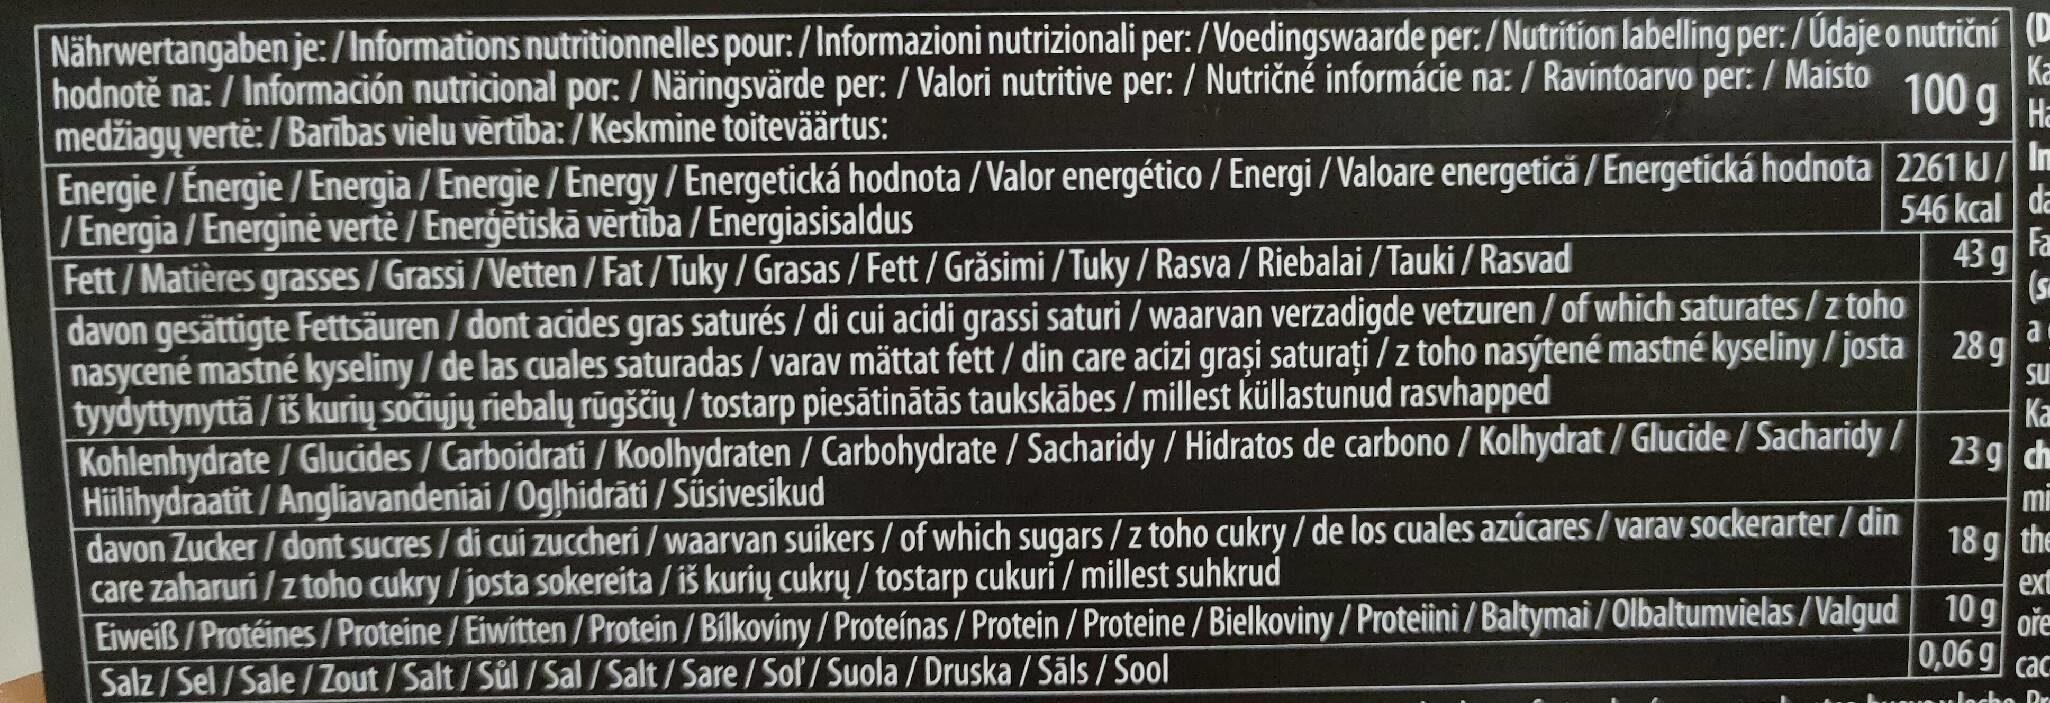 Chocolat noir extra 80% - Informació nutricional - fr